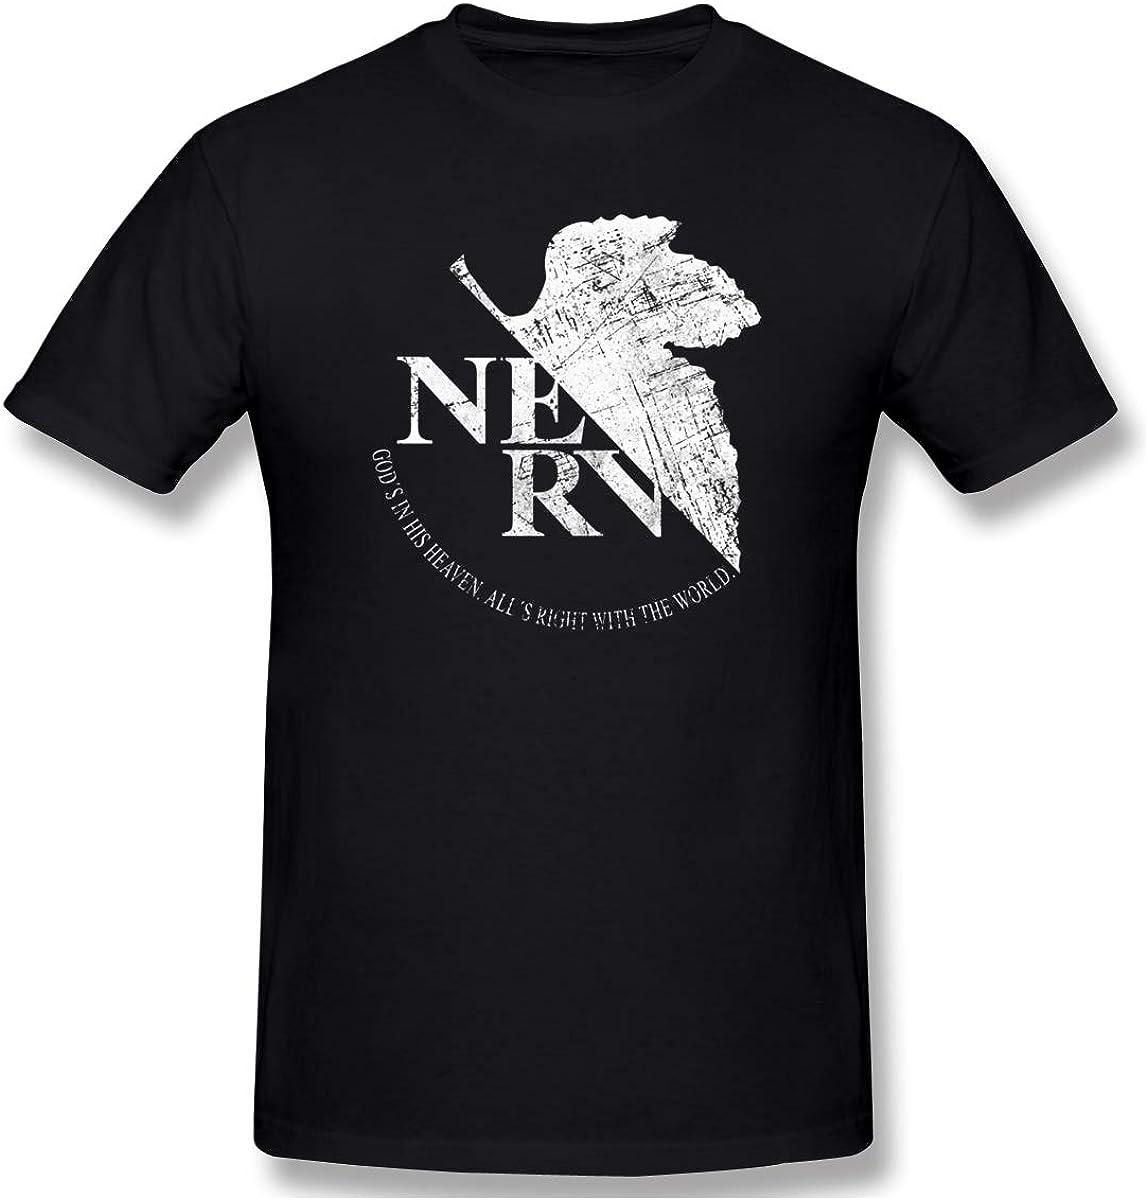 Neon Genesis Evangelion: NERV Logo Black T-Shirt